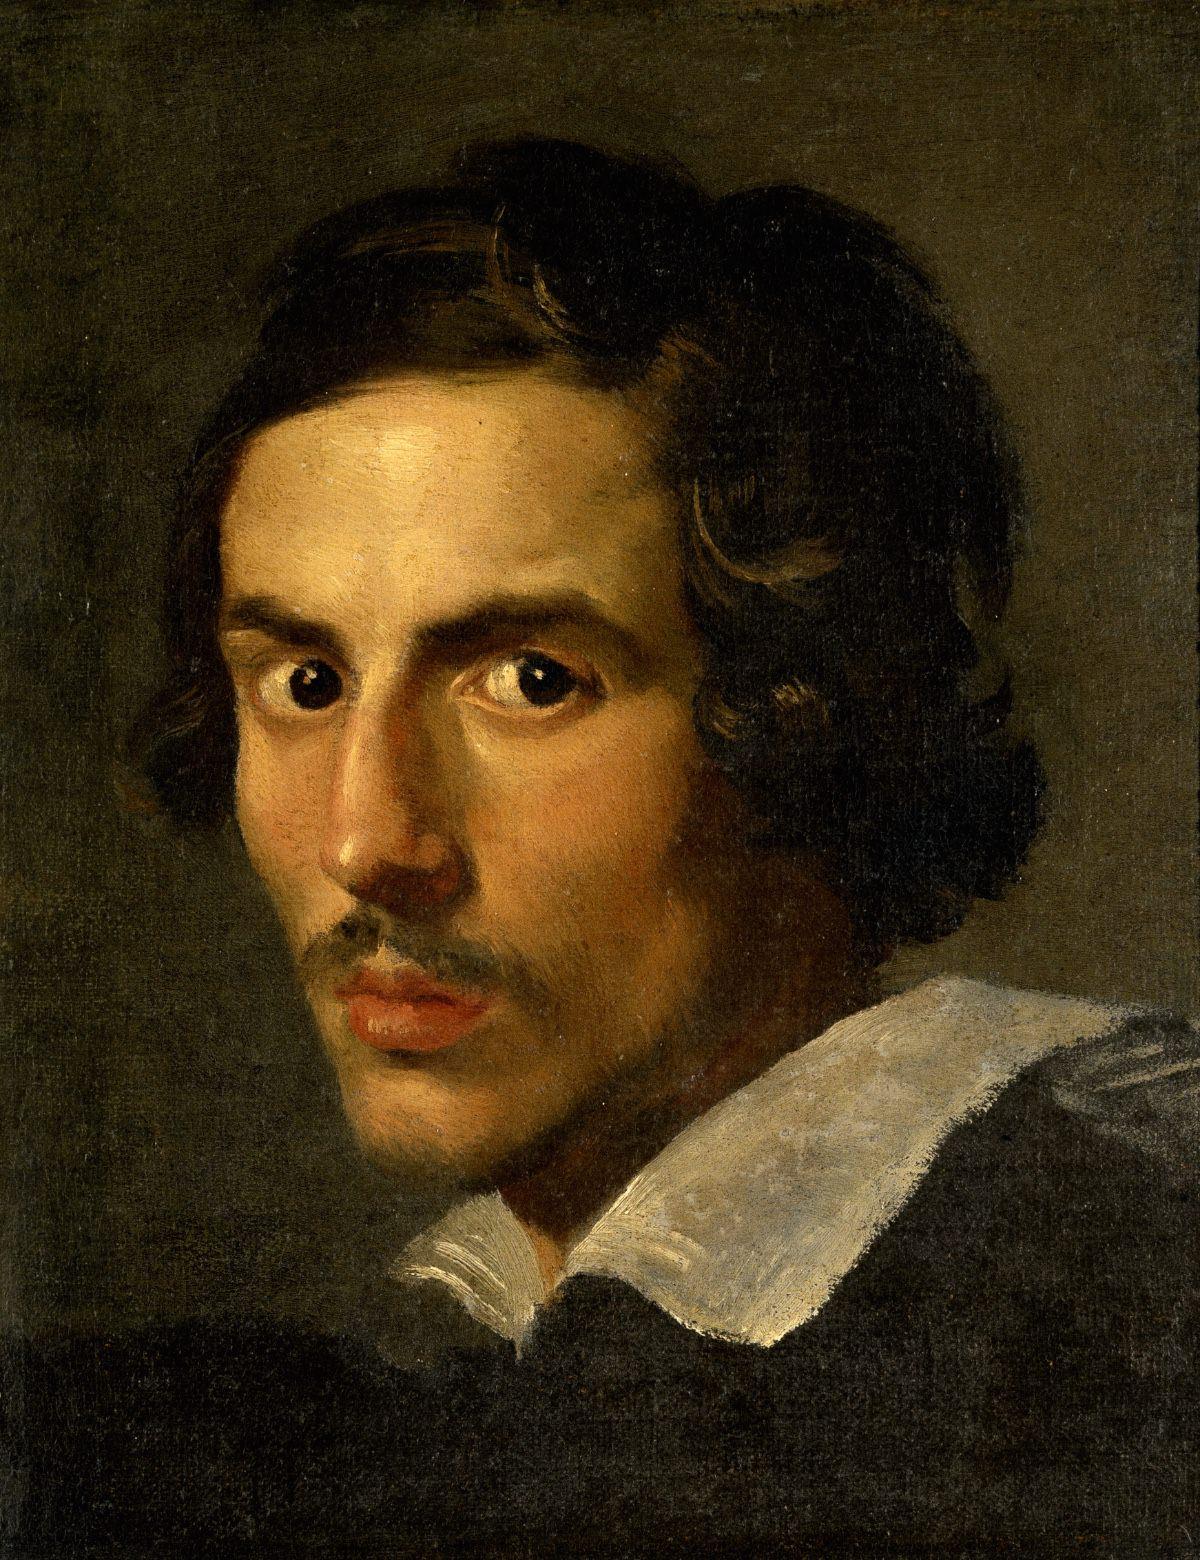 gian-lorenzo-bernini-autoritratto-1623-circa